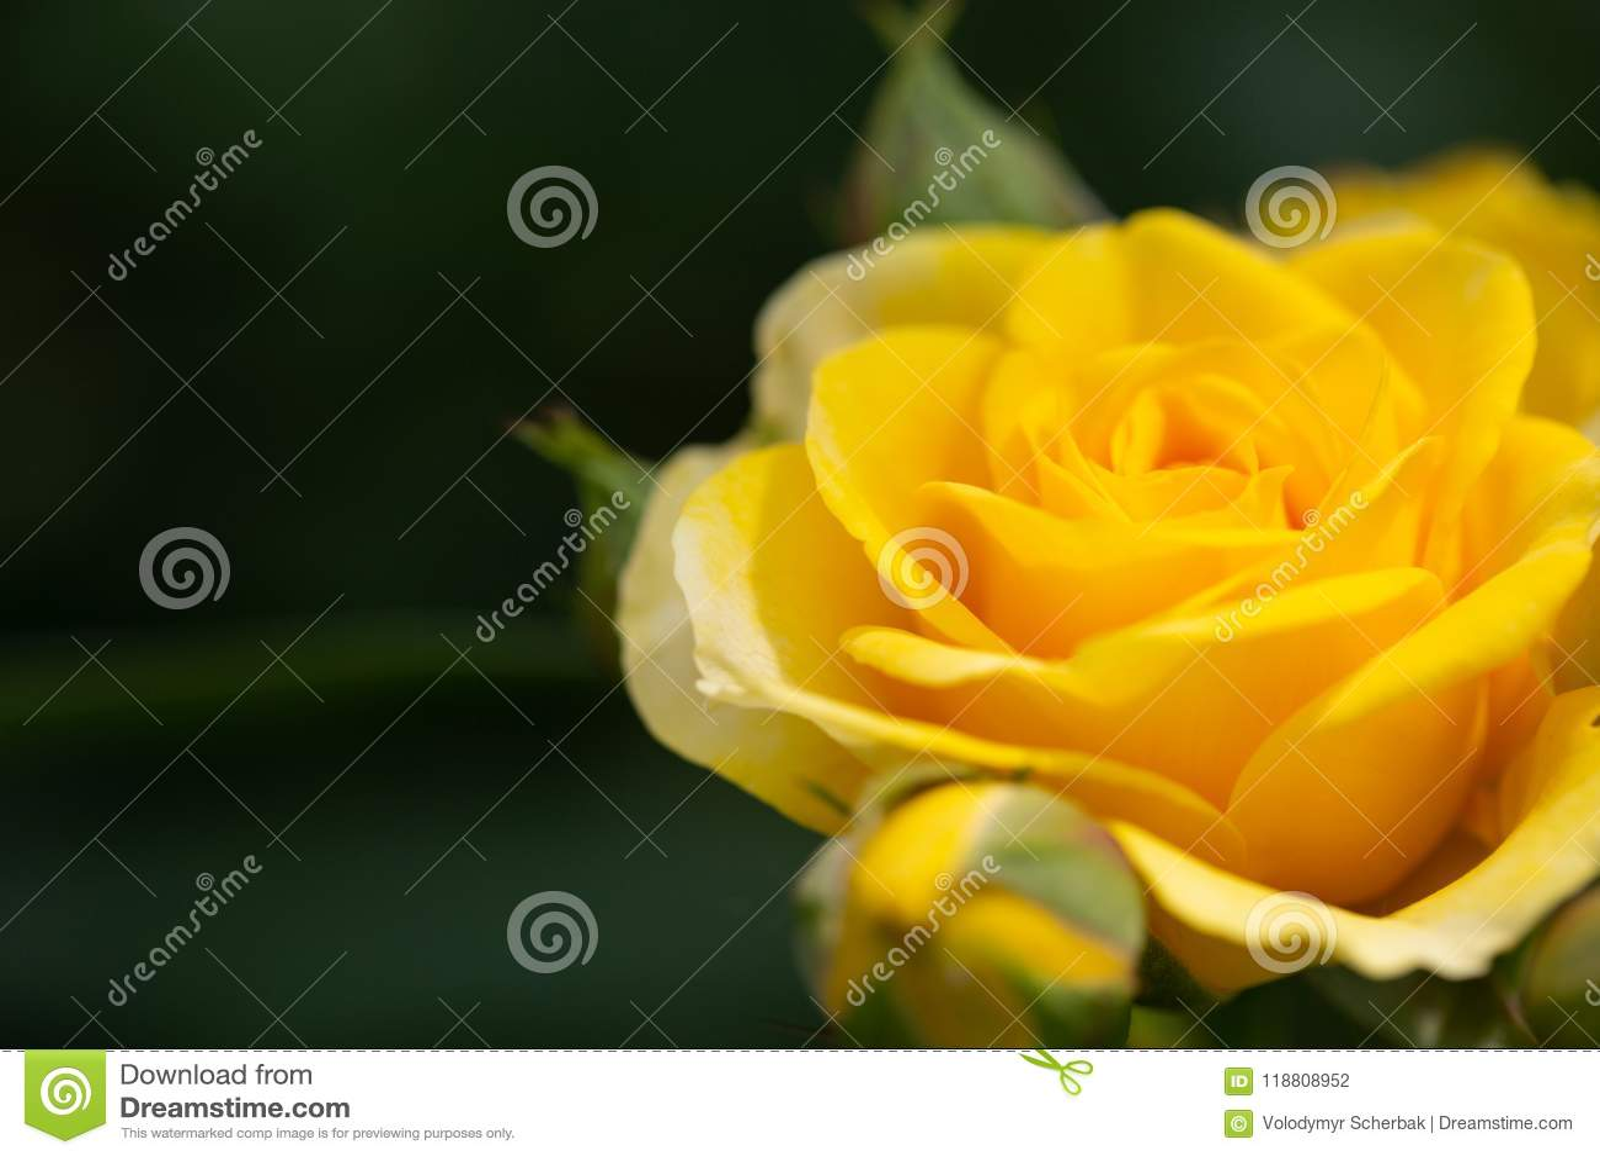 Yellow Rose Meaning Bright Cheerful And Joyful Create Warm Feelings